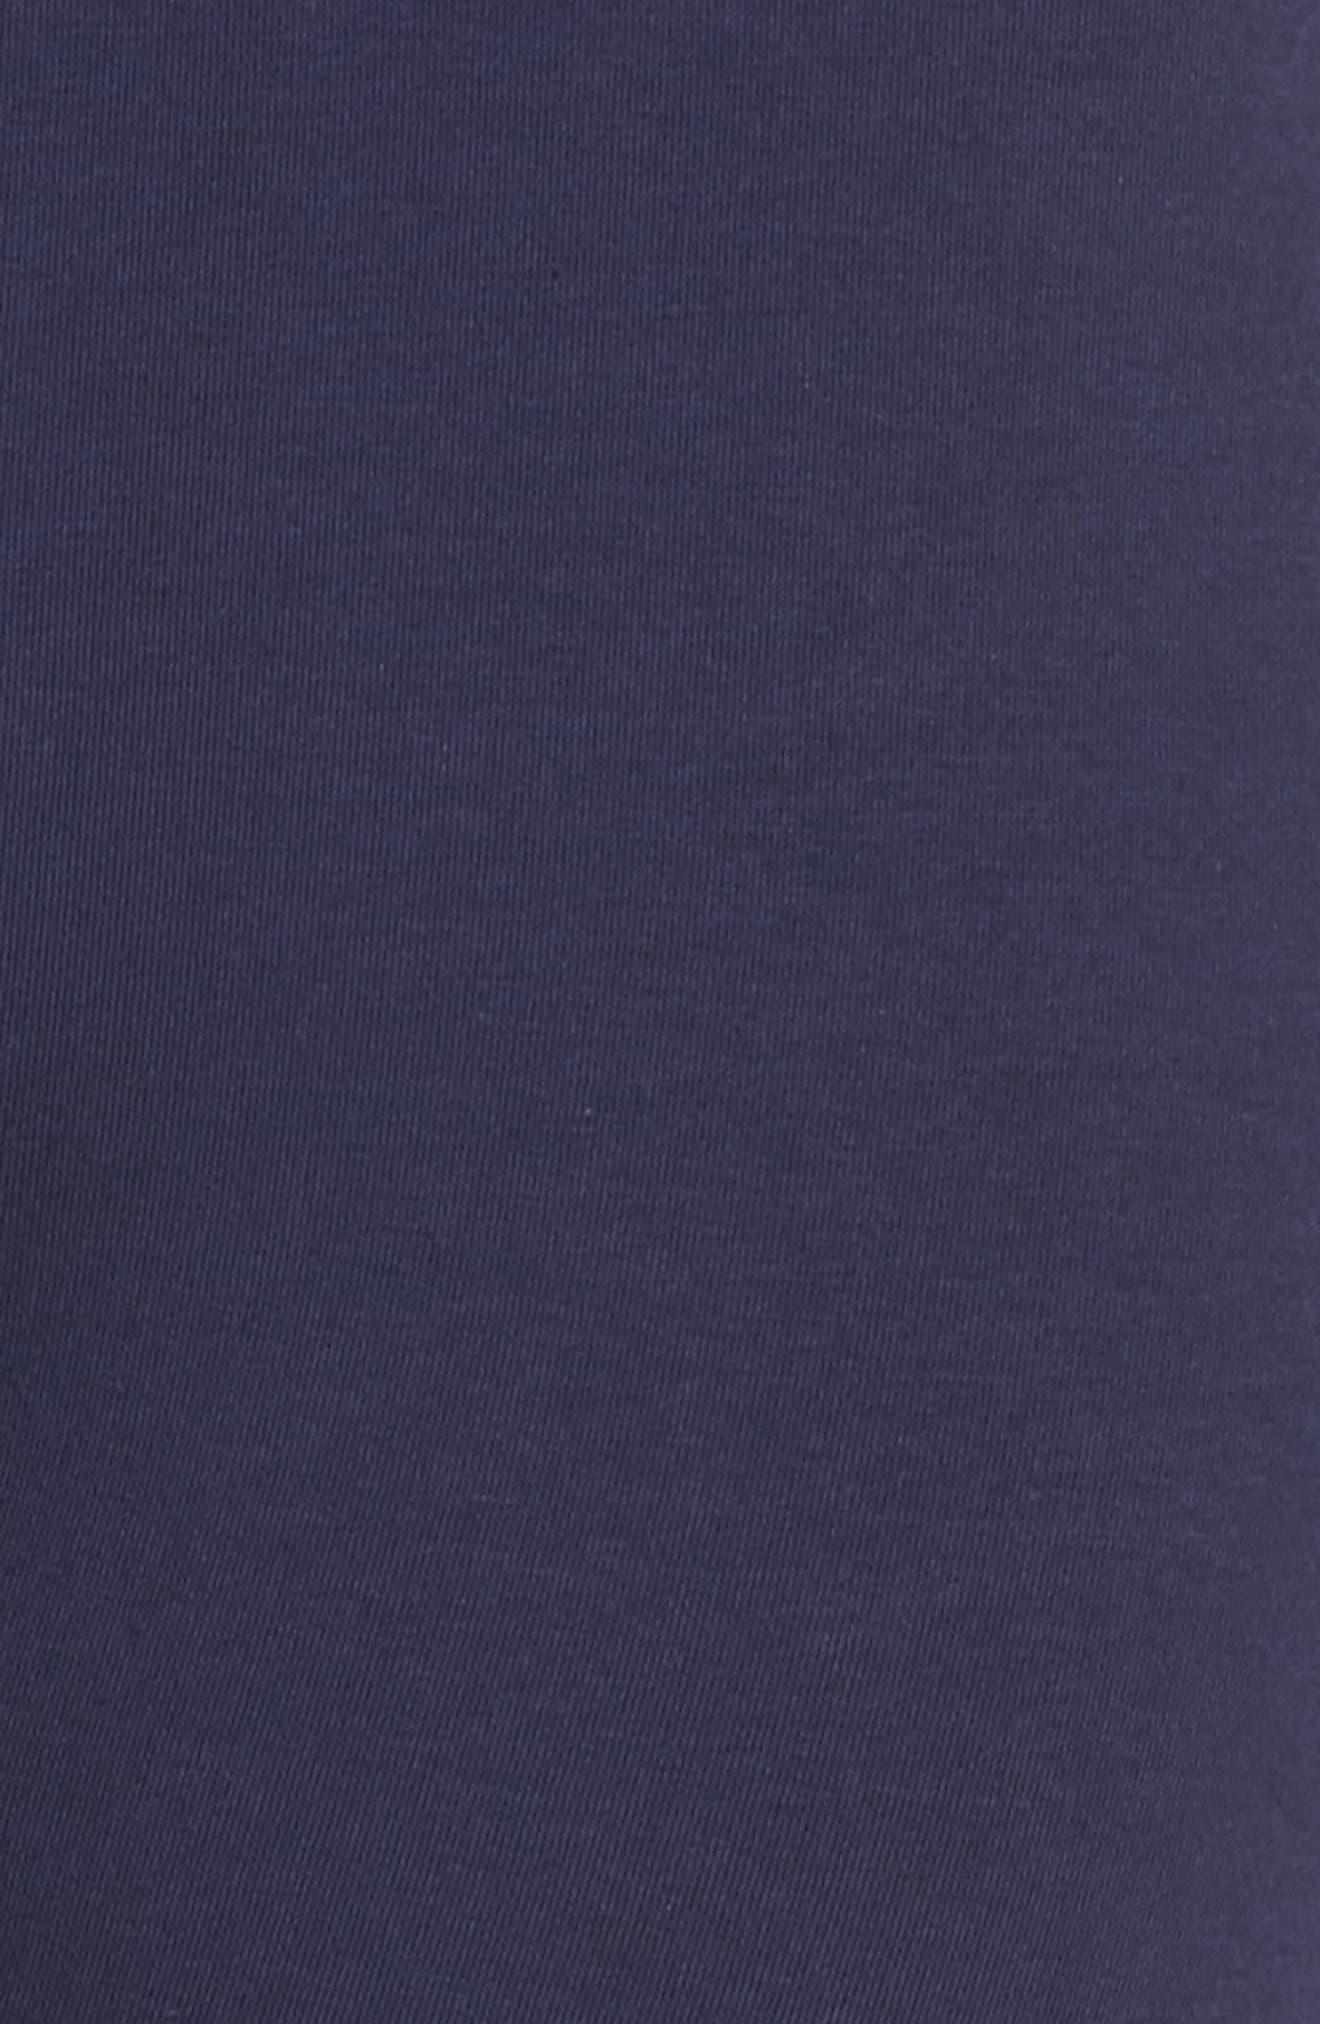 Harley Leggings,                             Alternate thumbnail 6, color,                             Navy/ White/ Chinese Red